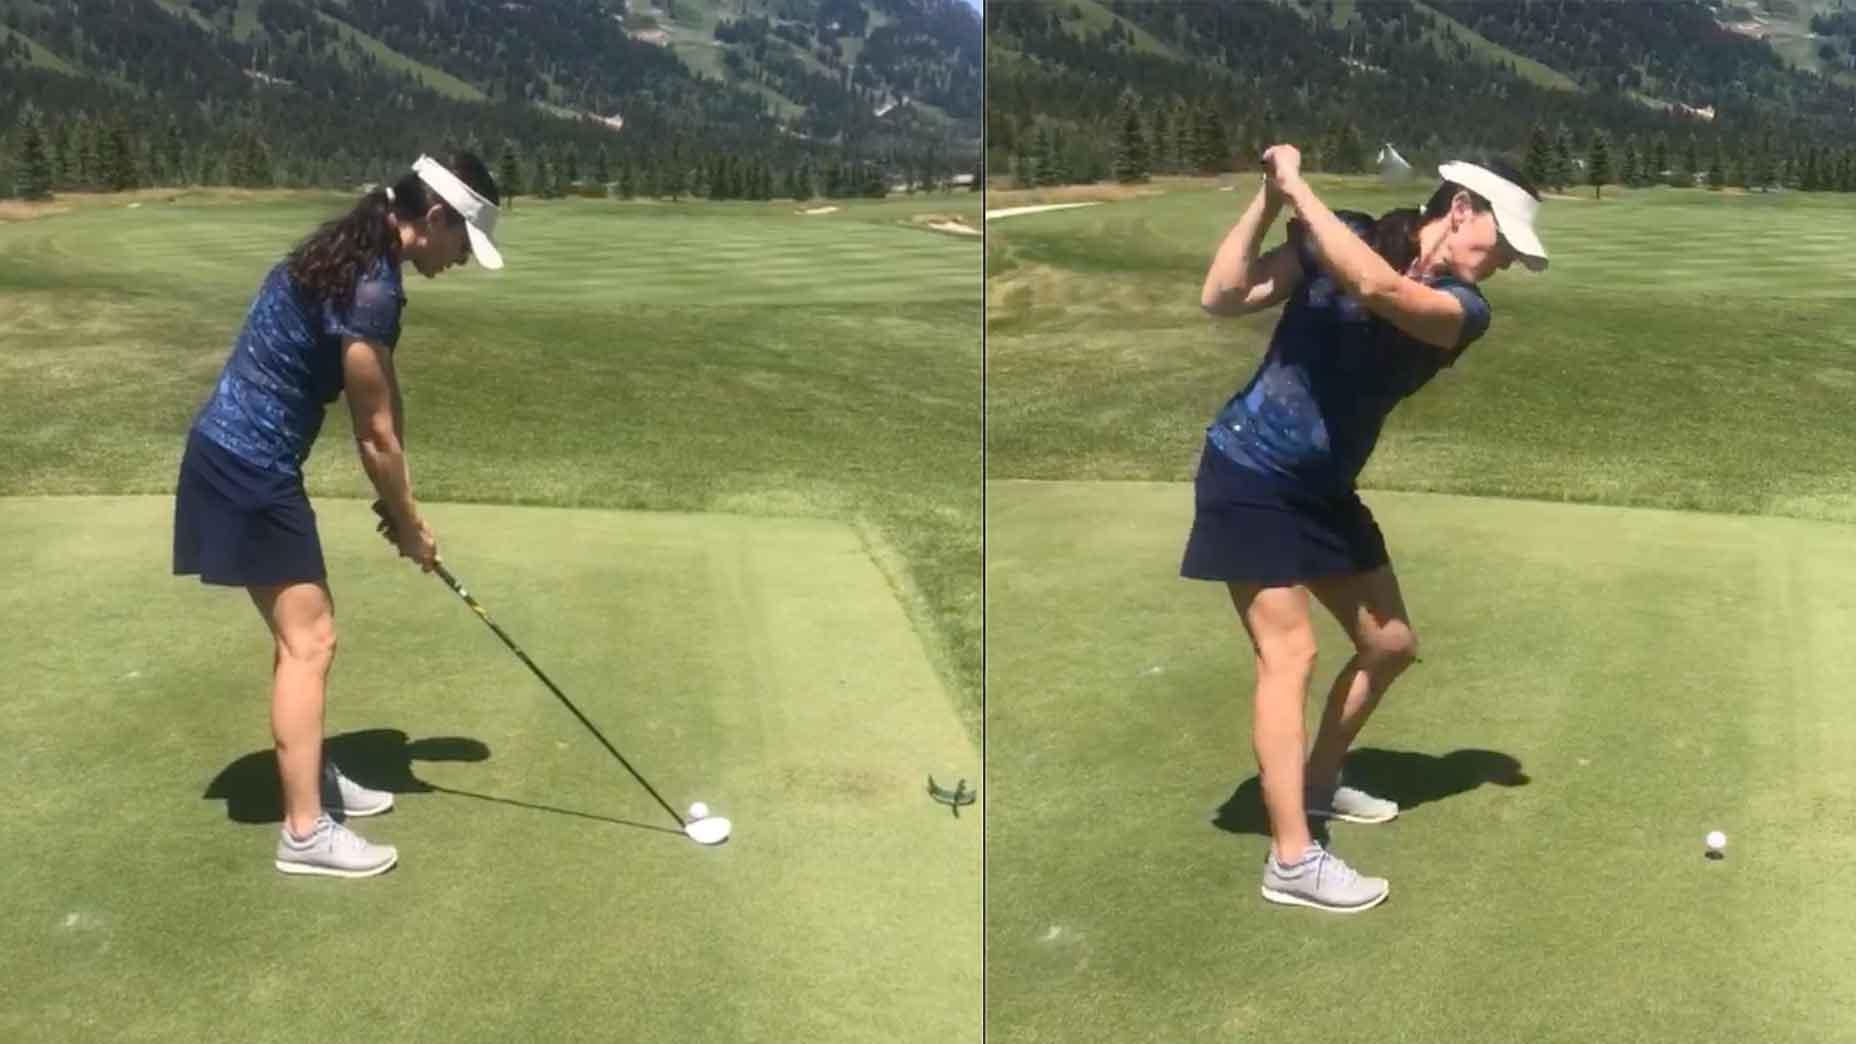 women's golf posture